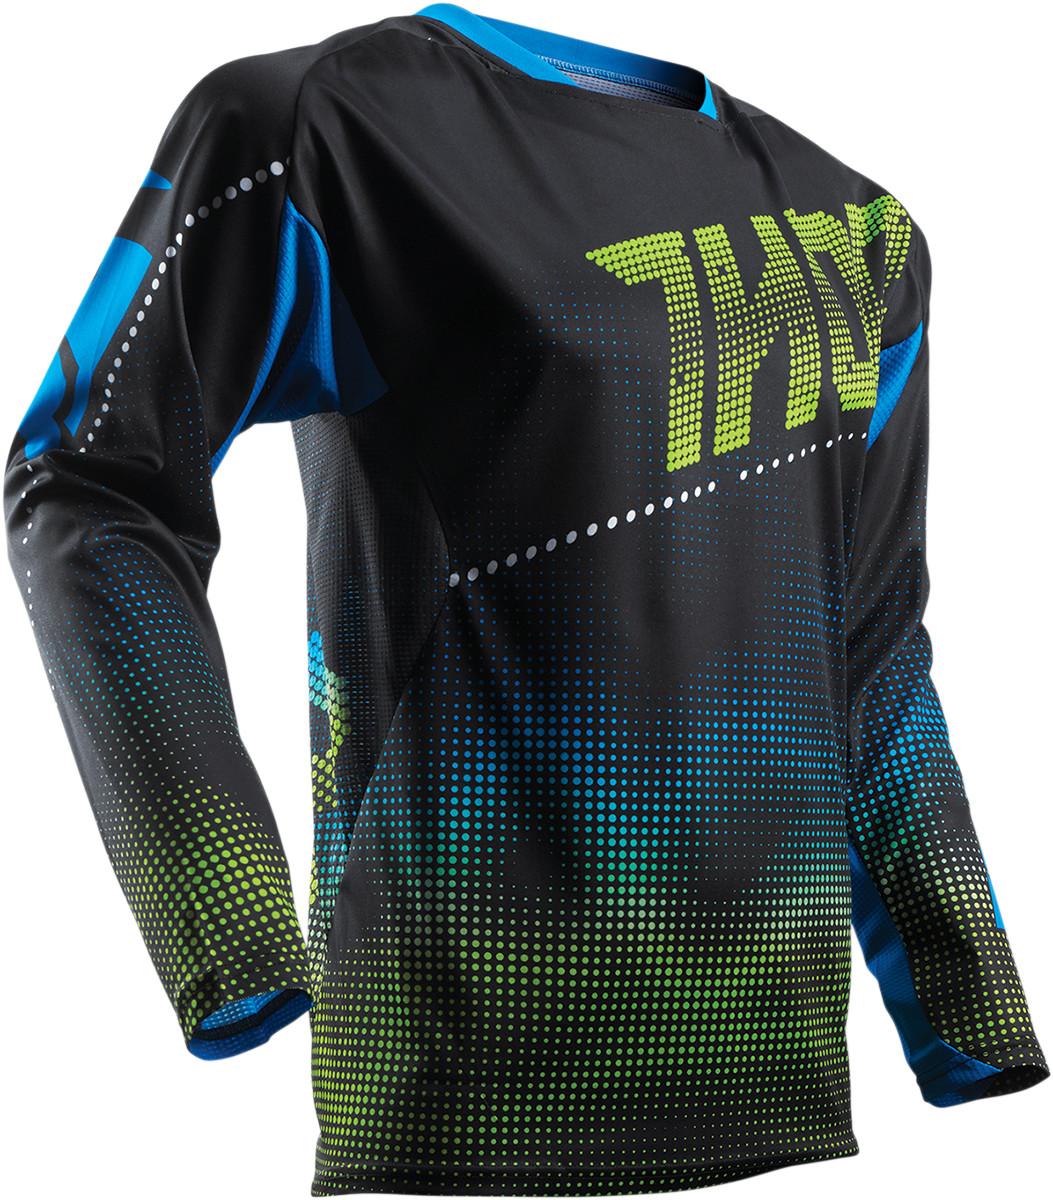 Black/Blue/Green Thor Fuse Lit Jersey